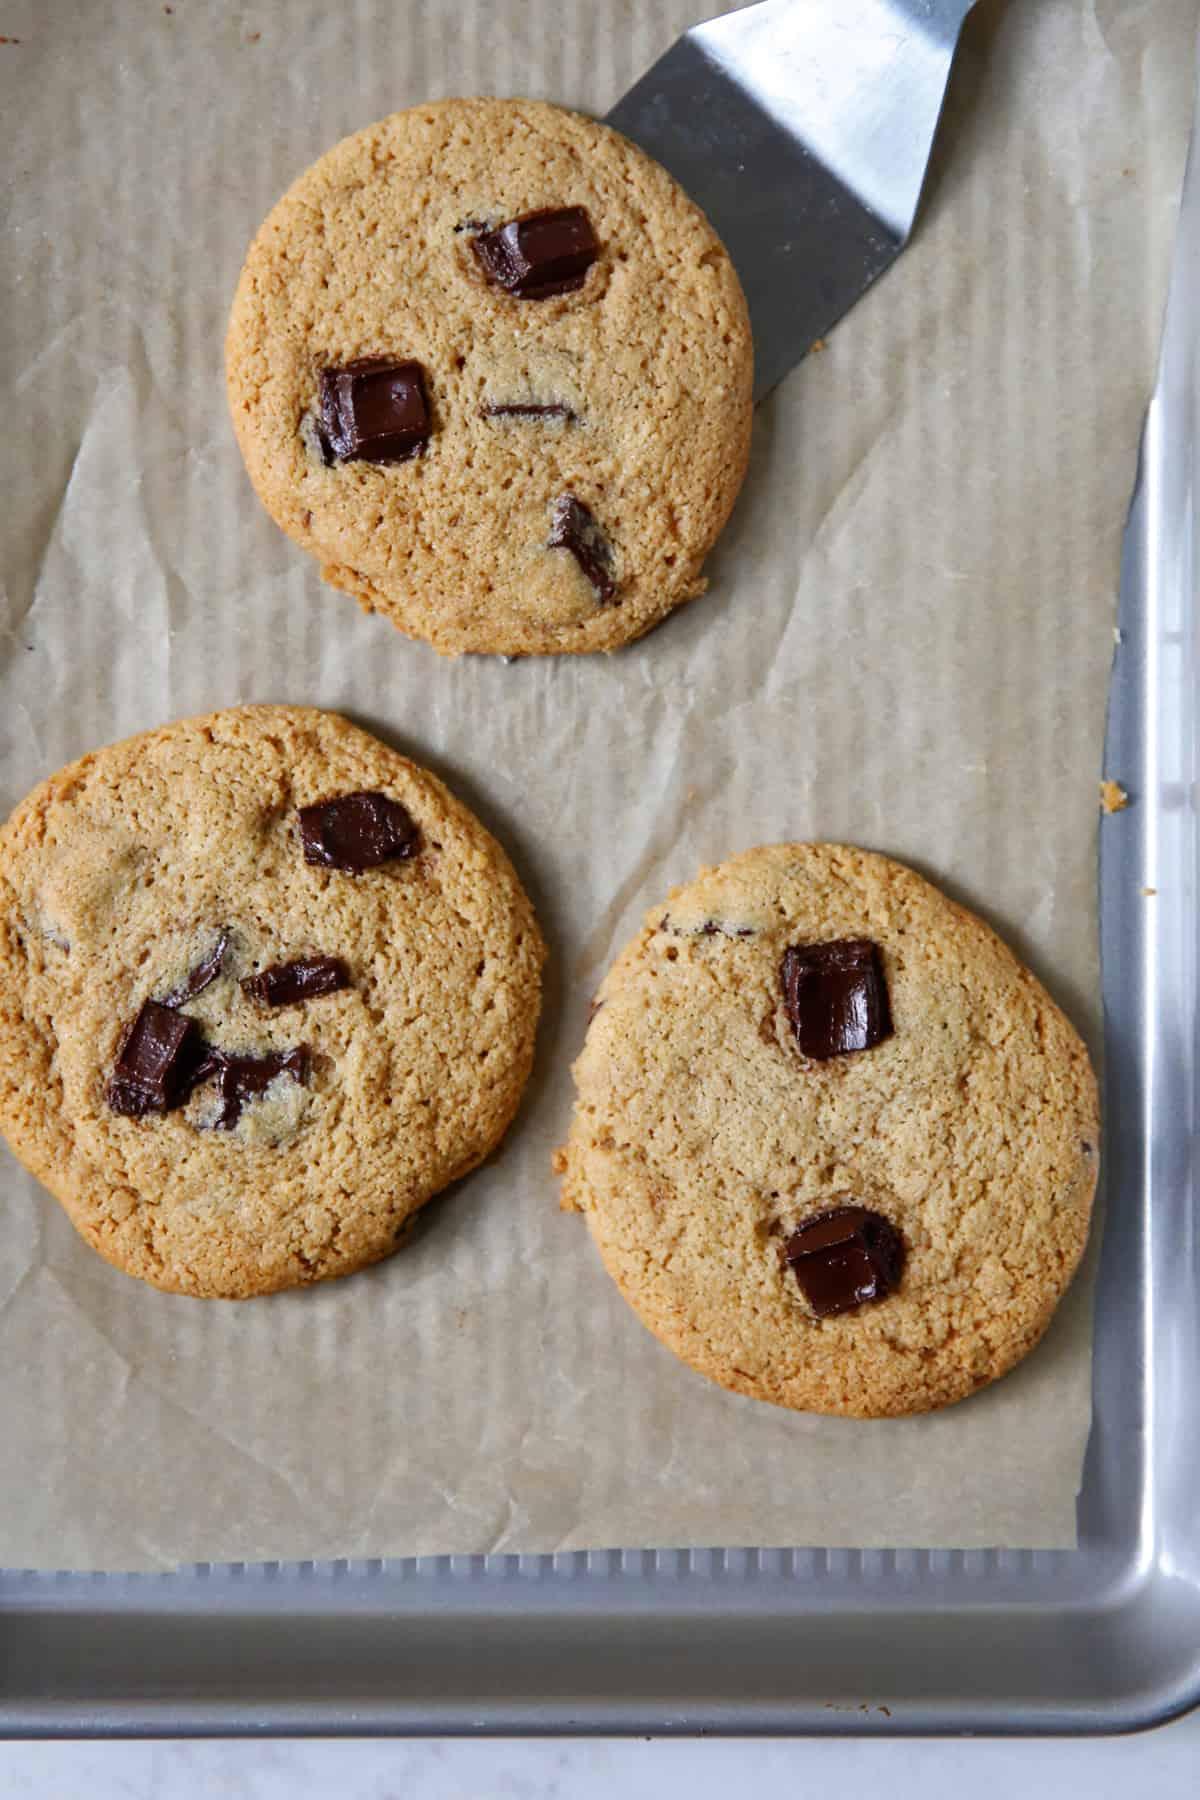 Easy gluten free chocolate chip cookie recipe